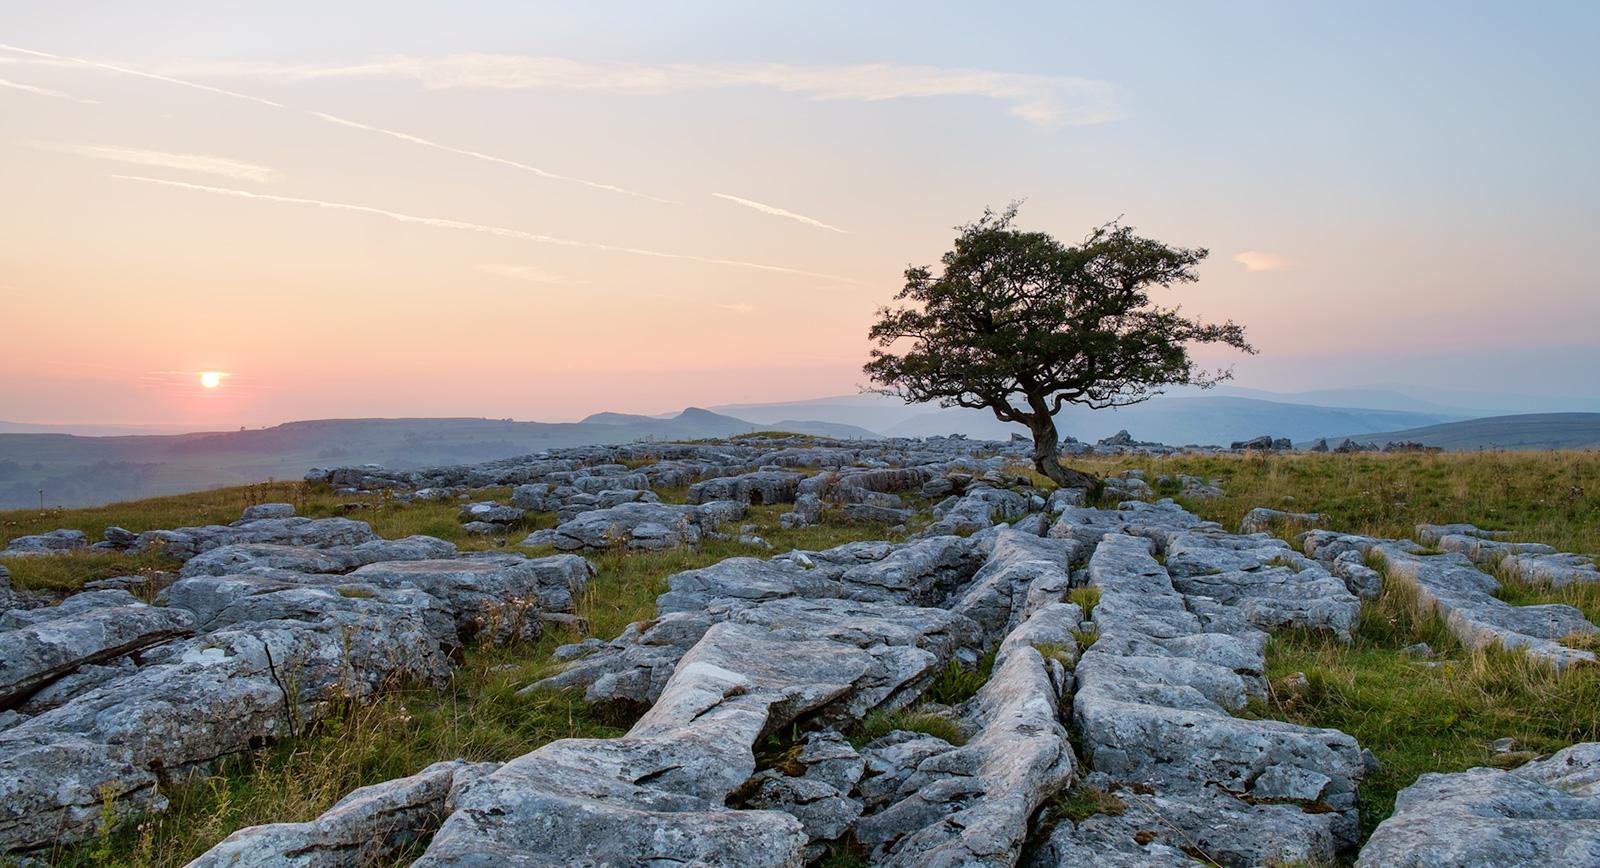 Sunset, Winskill stones